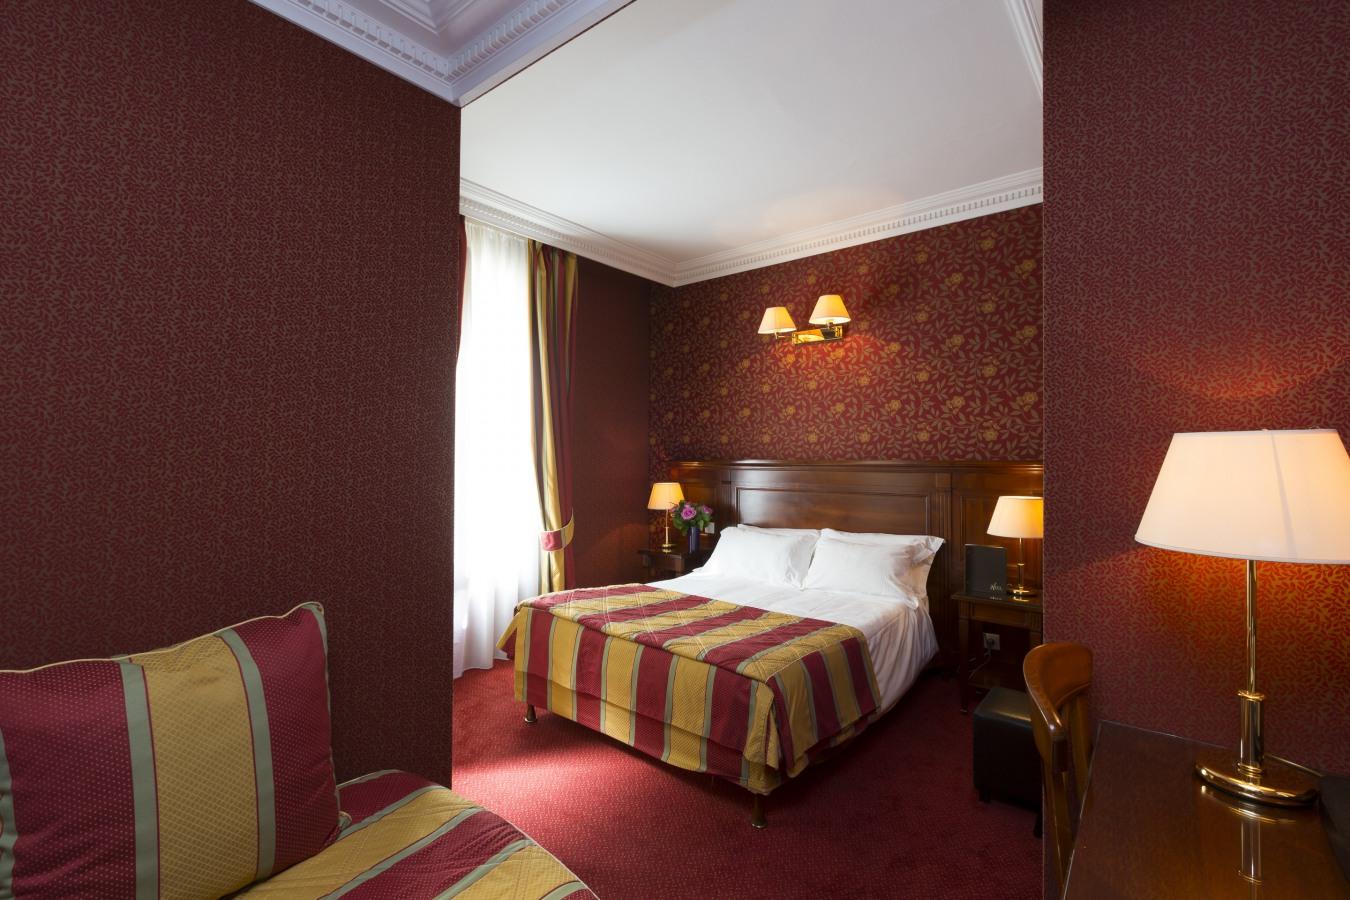 Hôtel Niel - Accueil